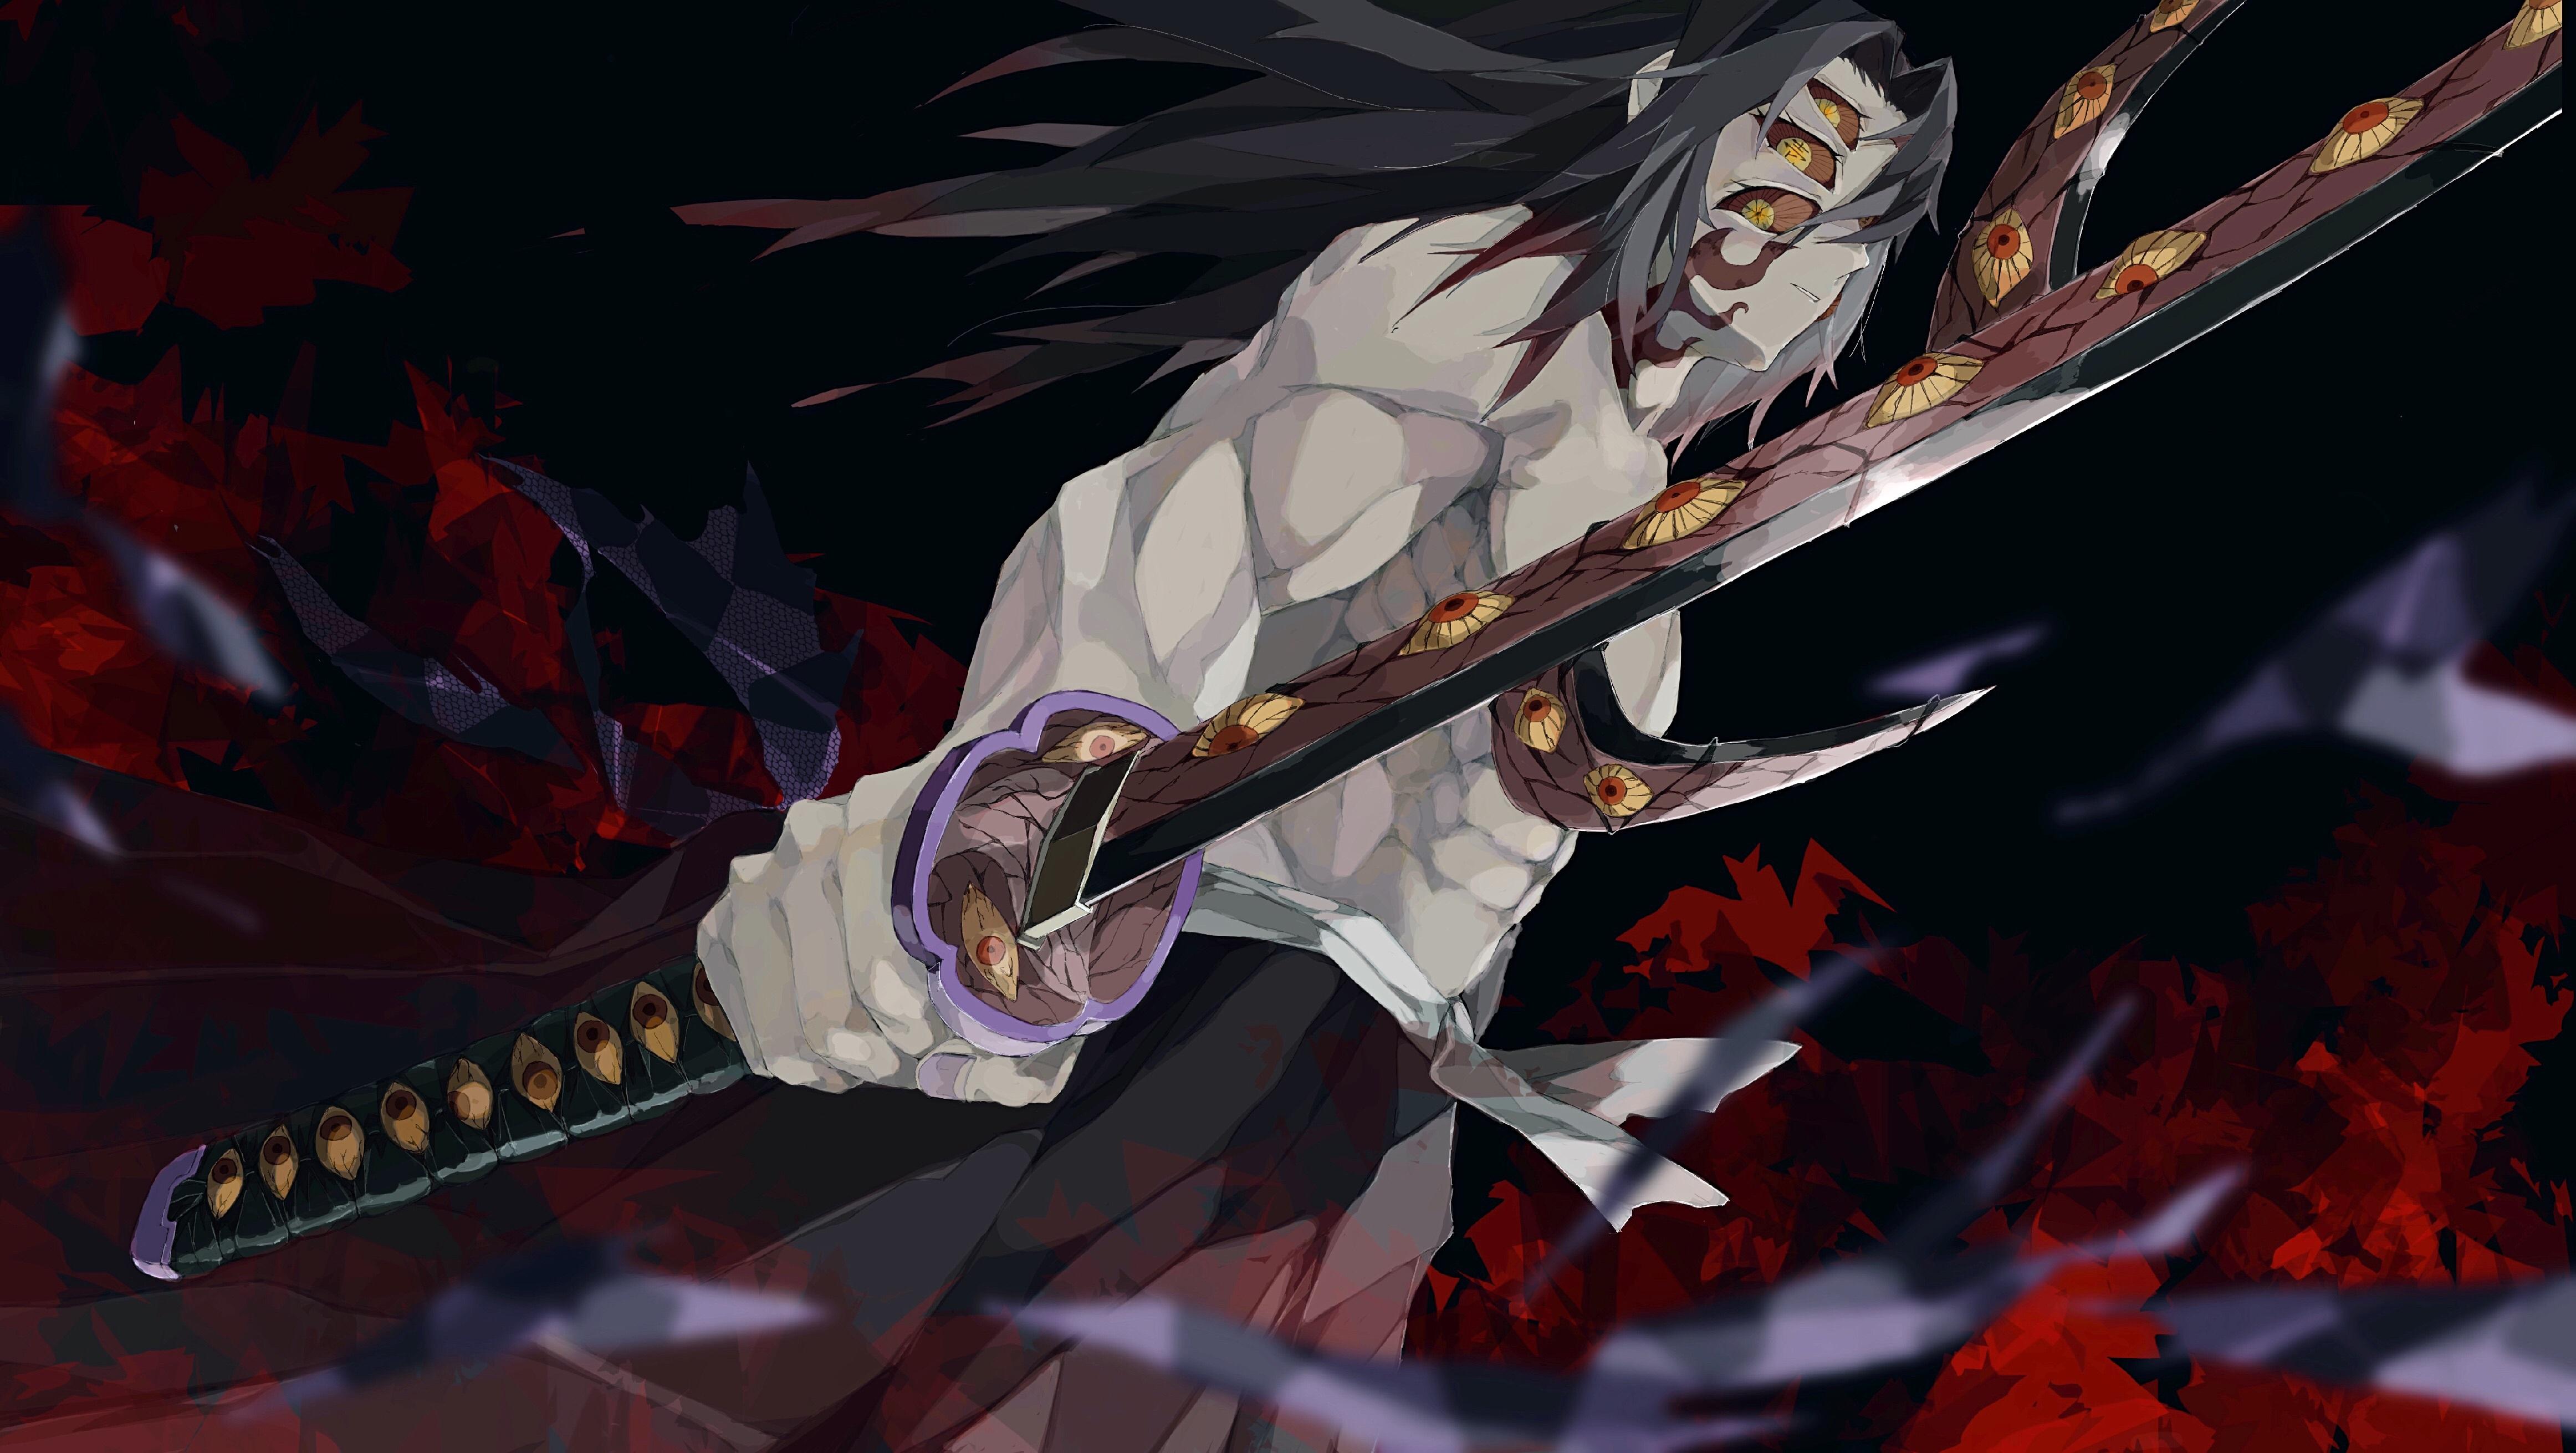 Demon Slayer Kimetsu no Yaiba 4k Ultra HD Wallpaper Background 4648x2621